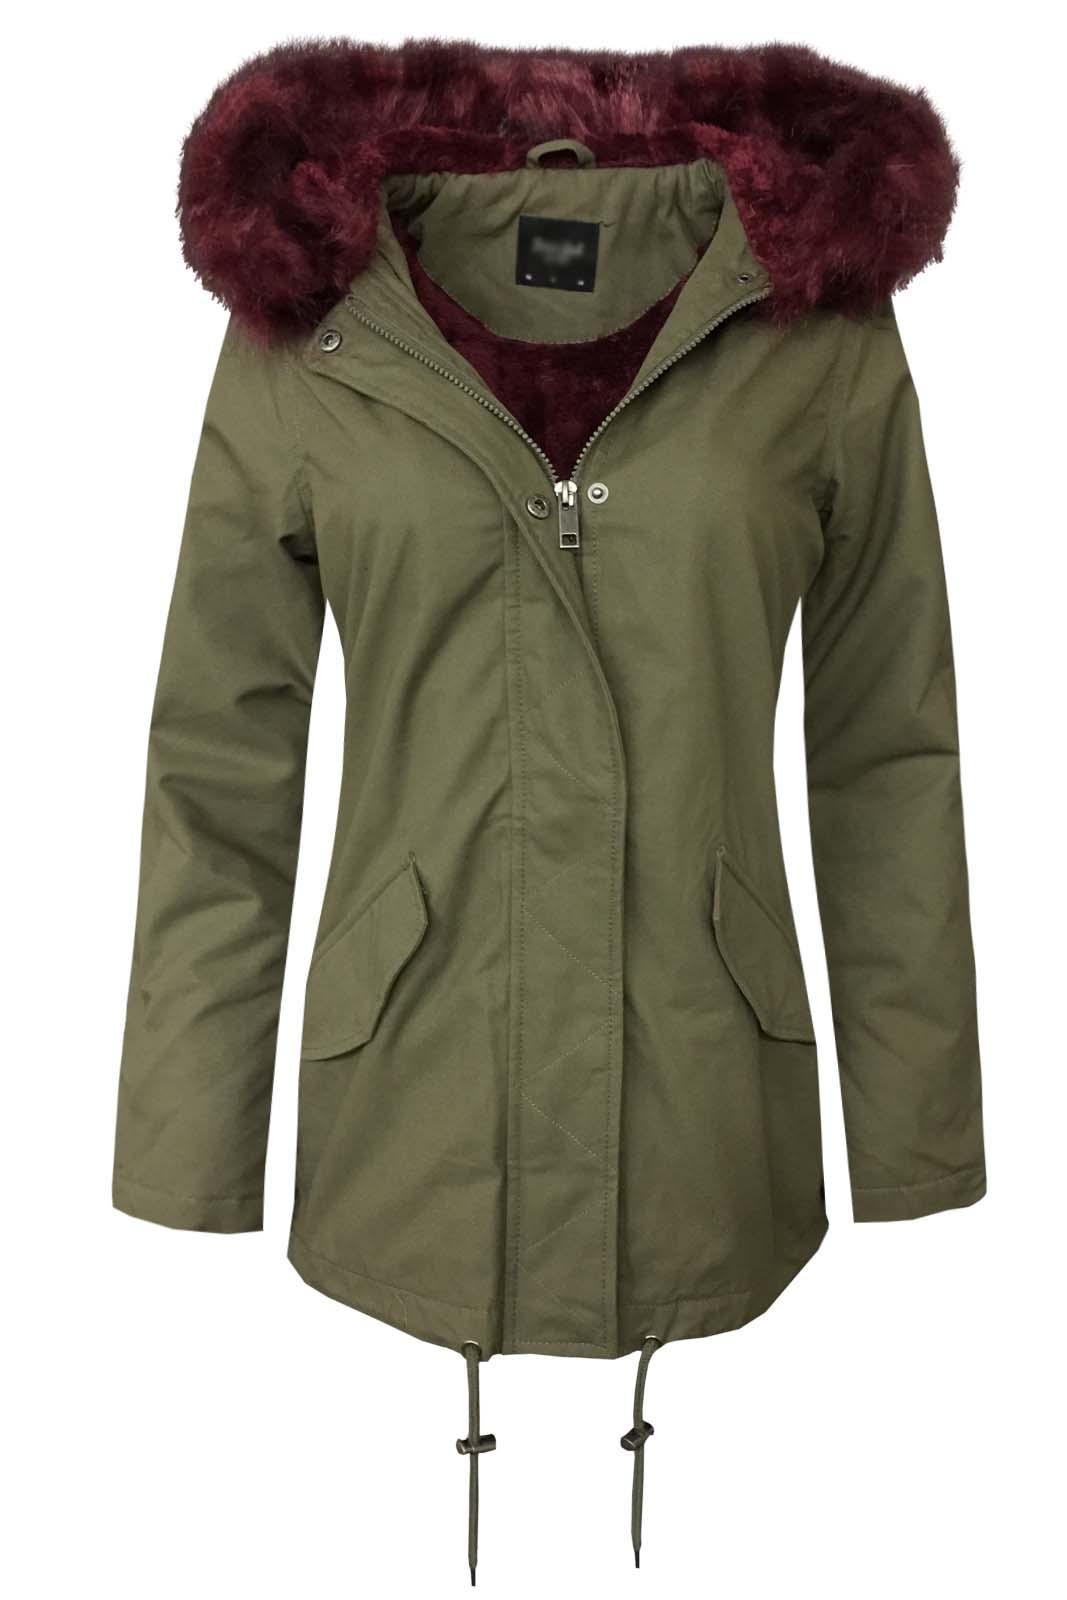 Ladies Cotton Faux Fur Hooded Warm Winter Coat Womens ...